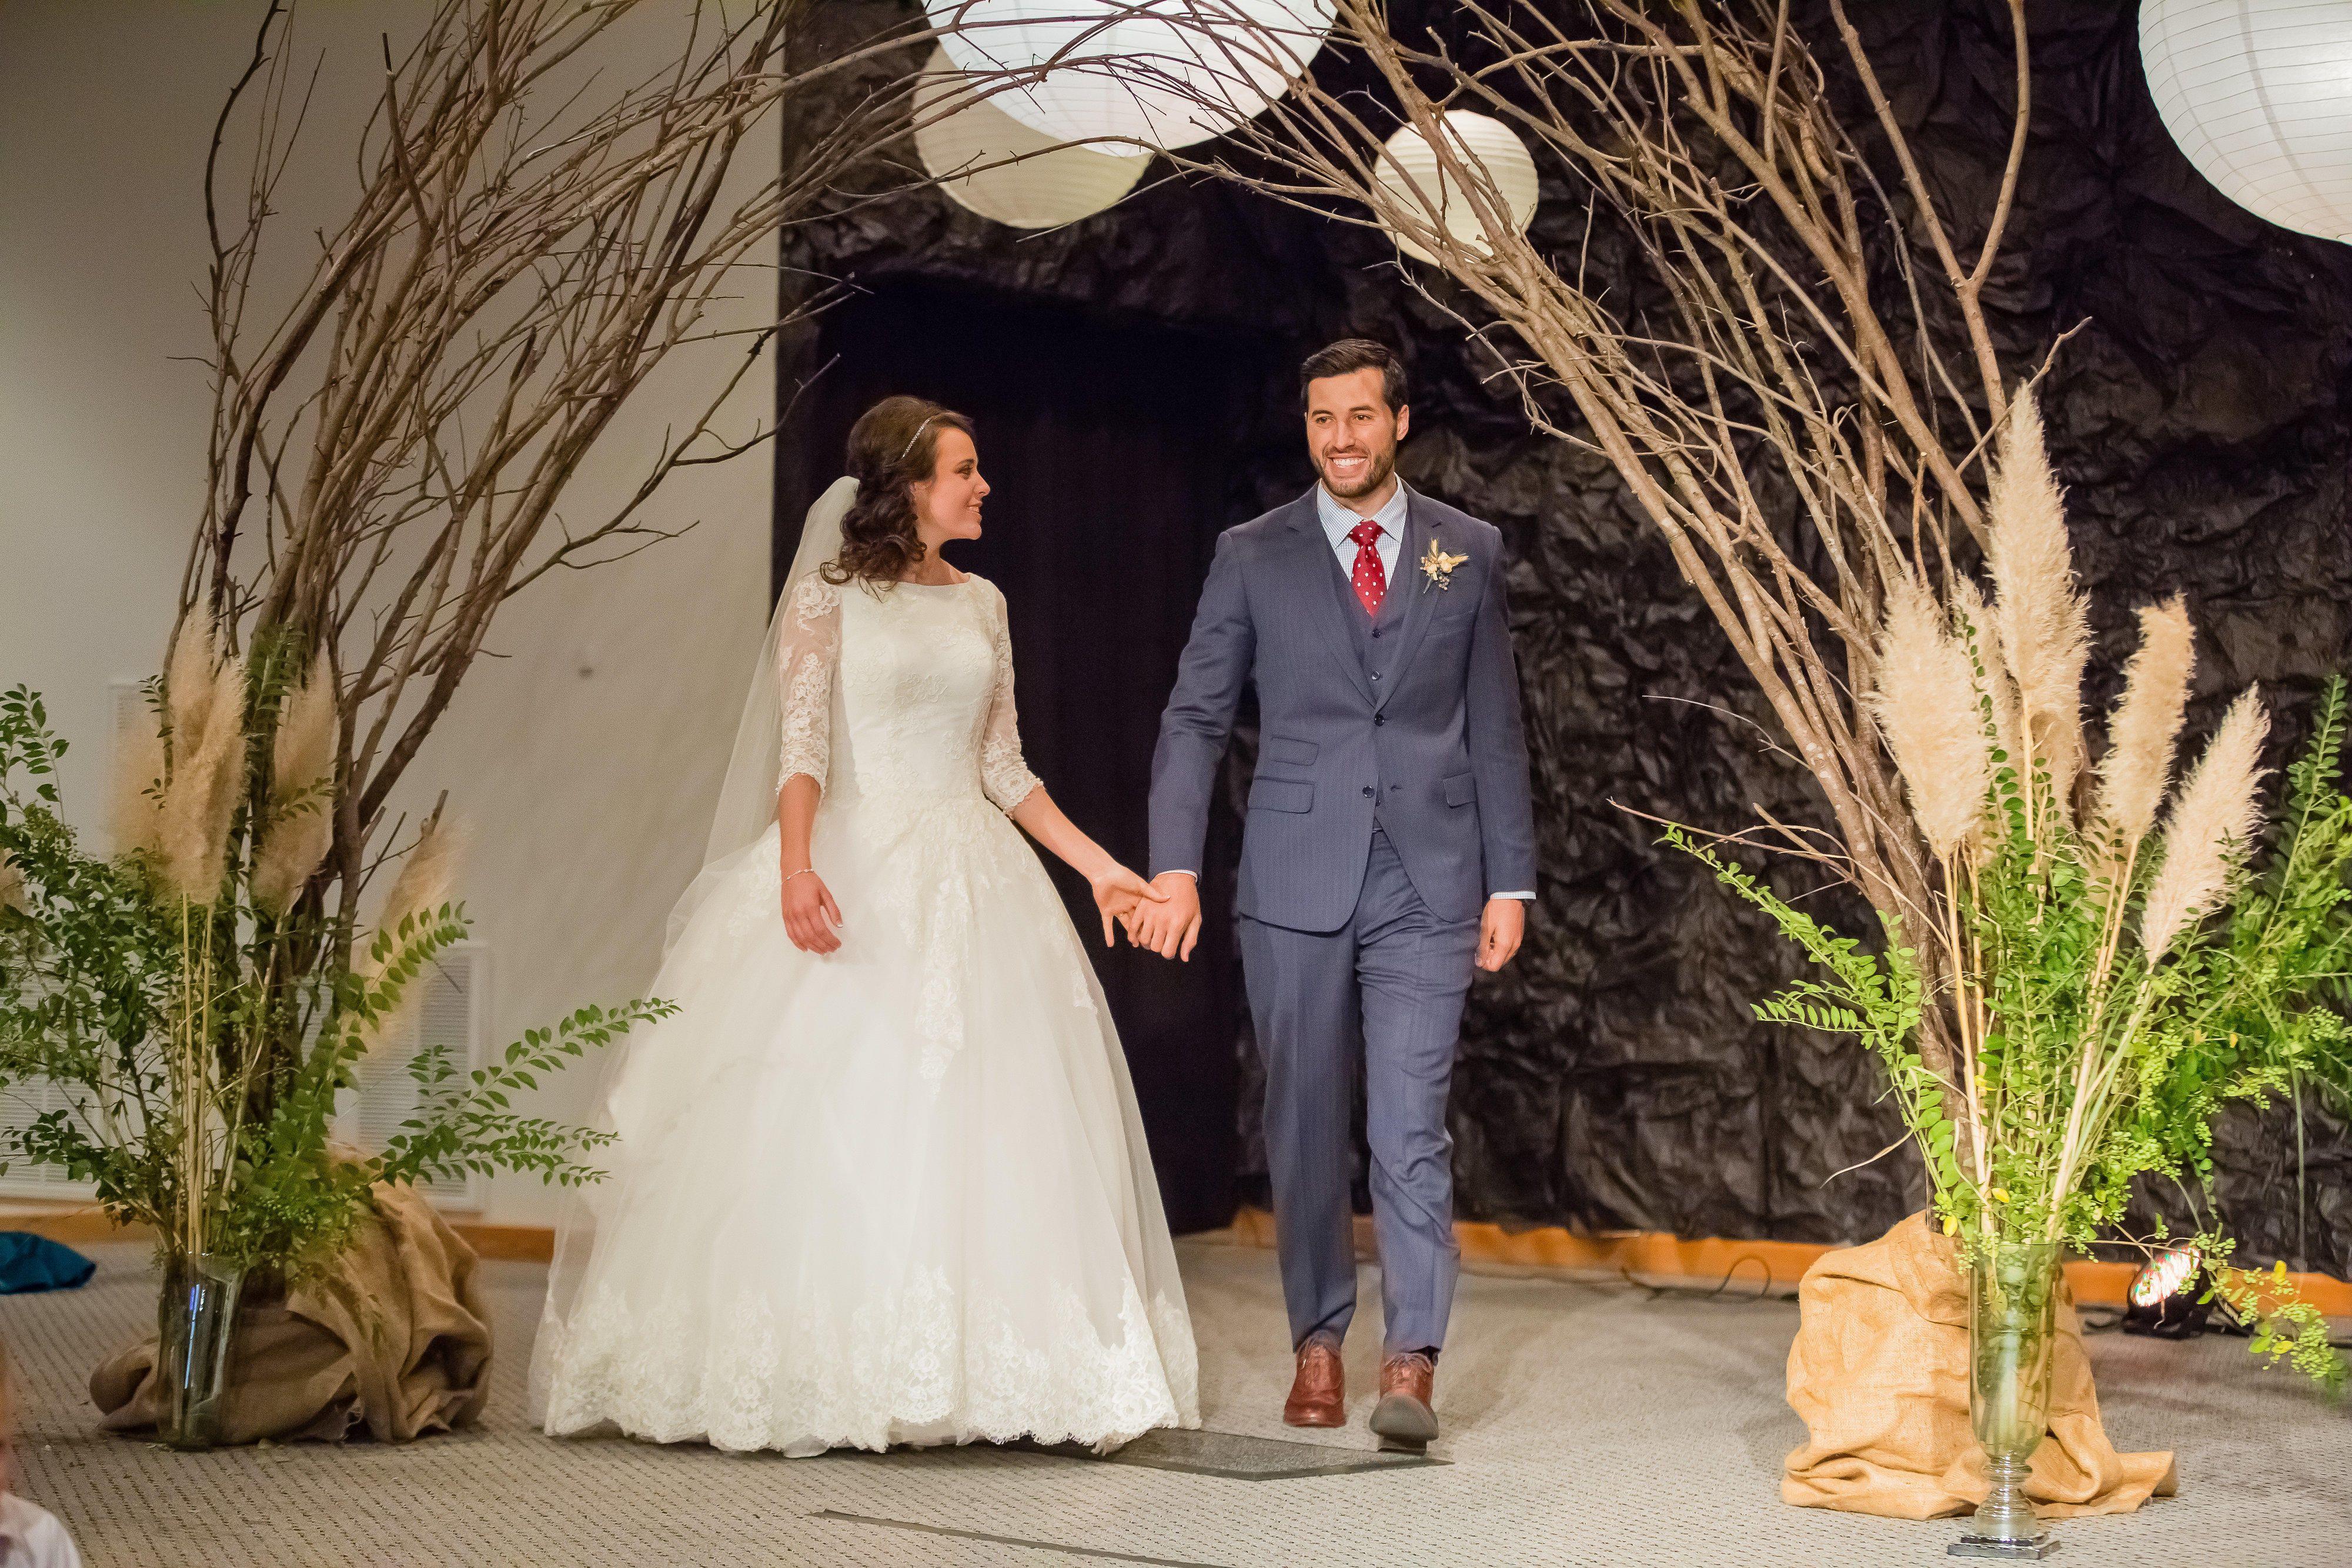 Official Site Duggar wedding, Jinger duggar wedding